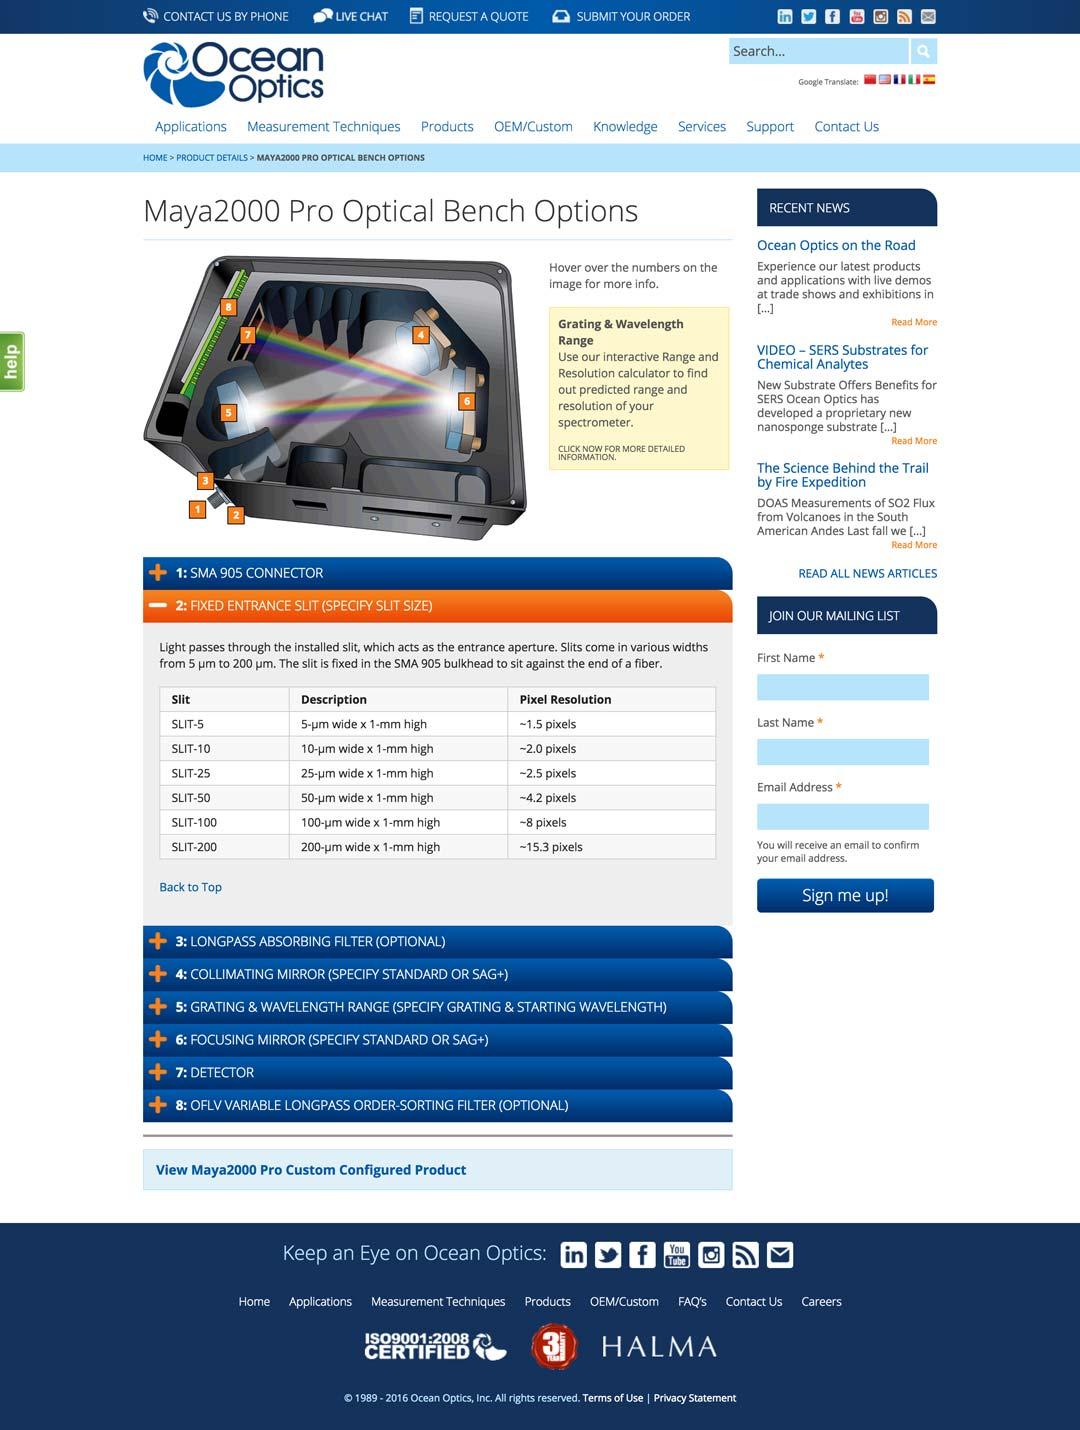 Grafx Design & Digital Agency, Tampa Bay, Florida » Ocean Optics Website